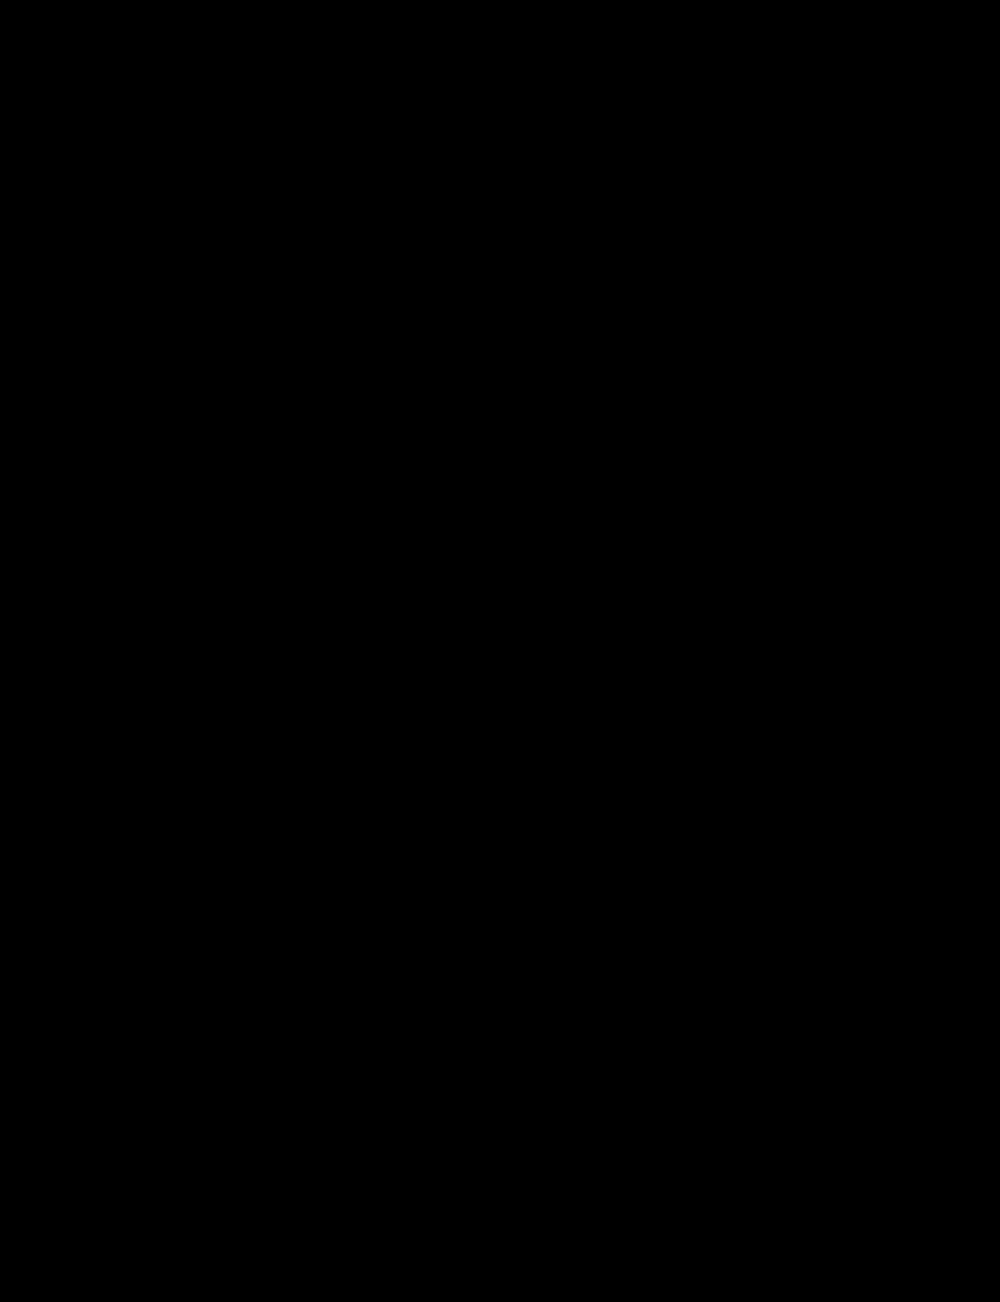 Le carré iroquoi d'Eugène Perma